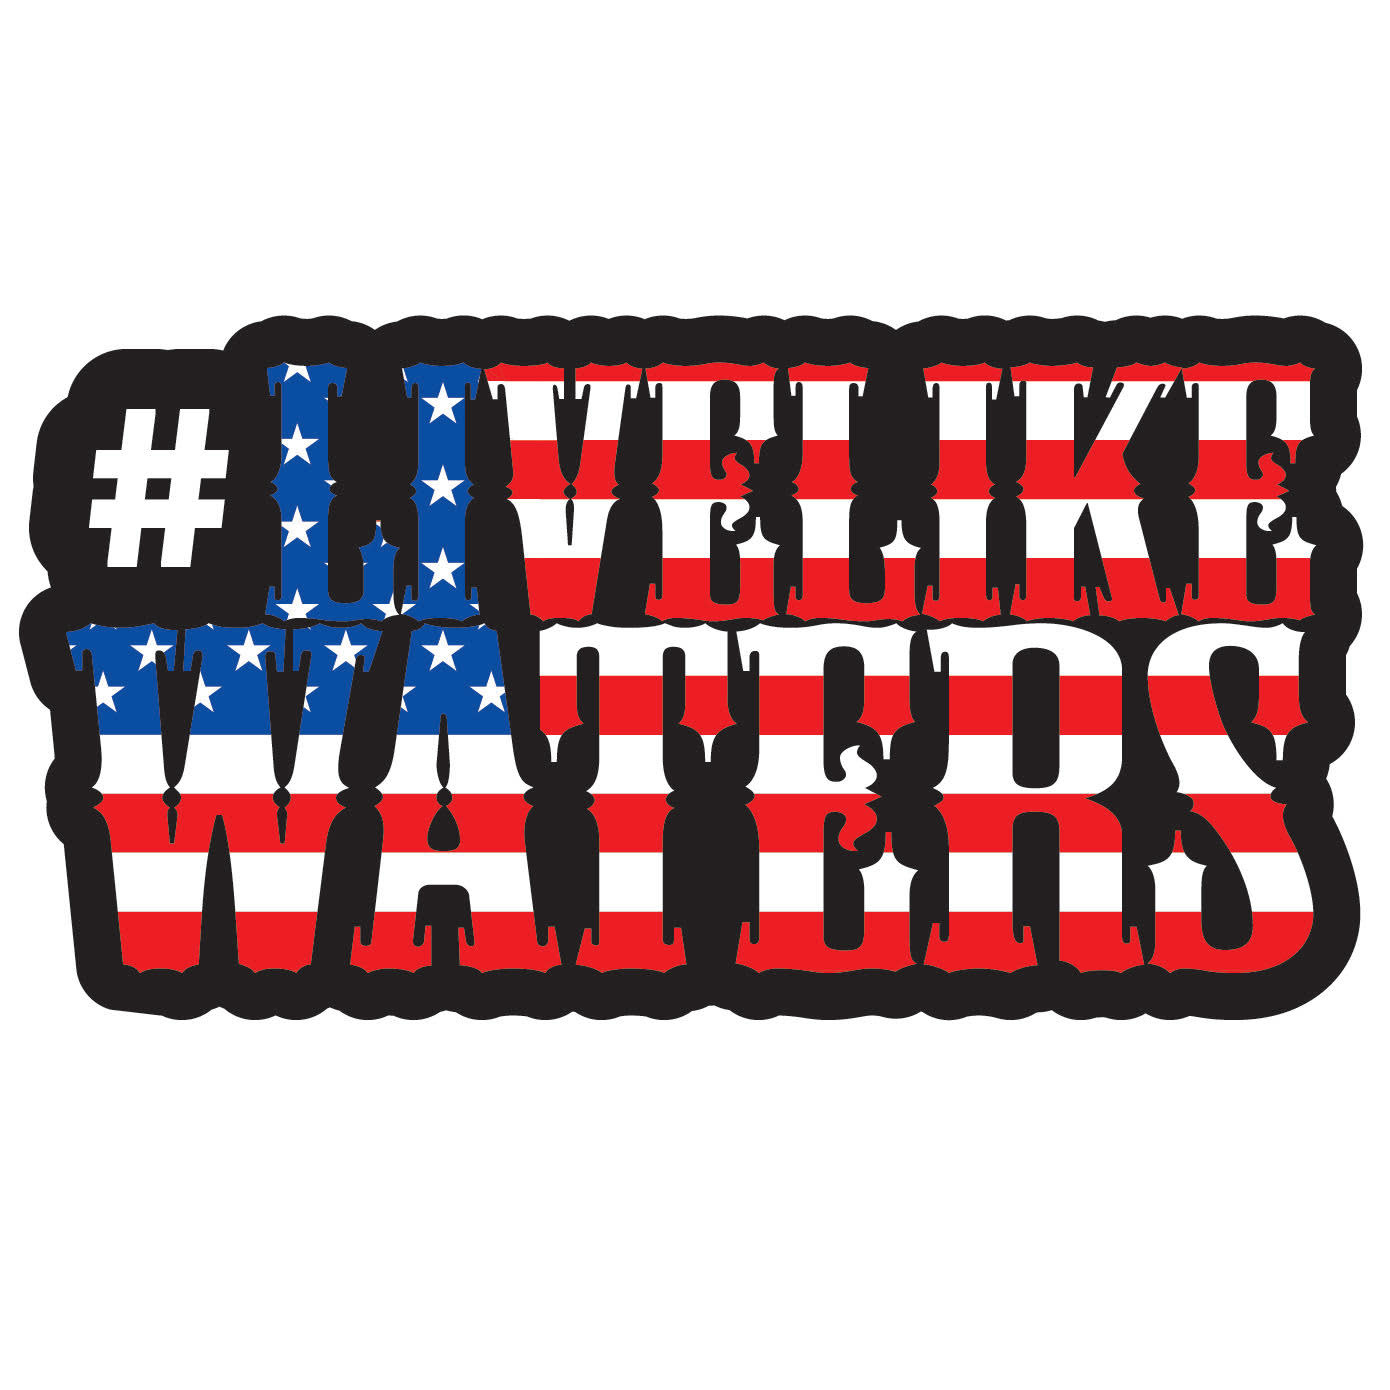 #LiveLikeWaters sticker 3x4